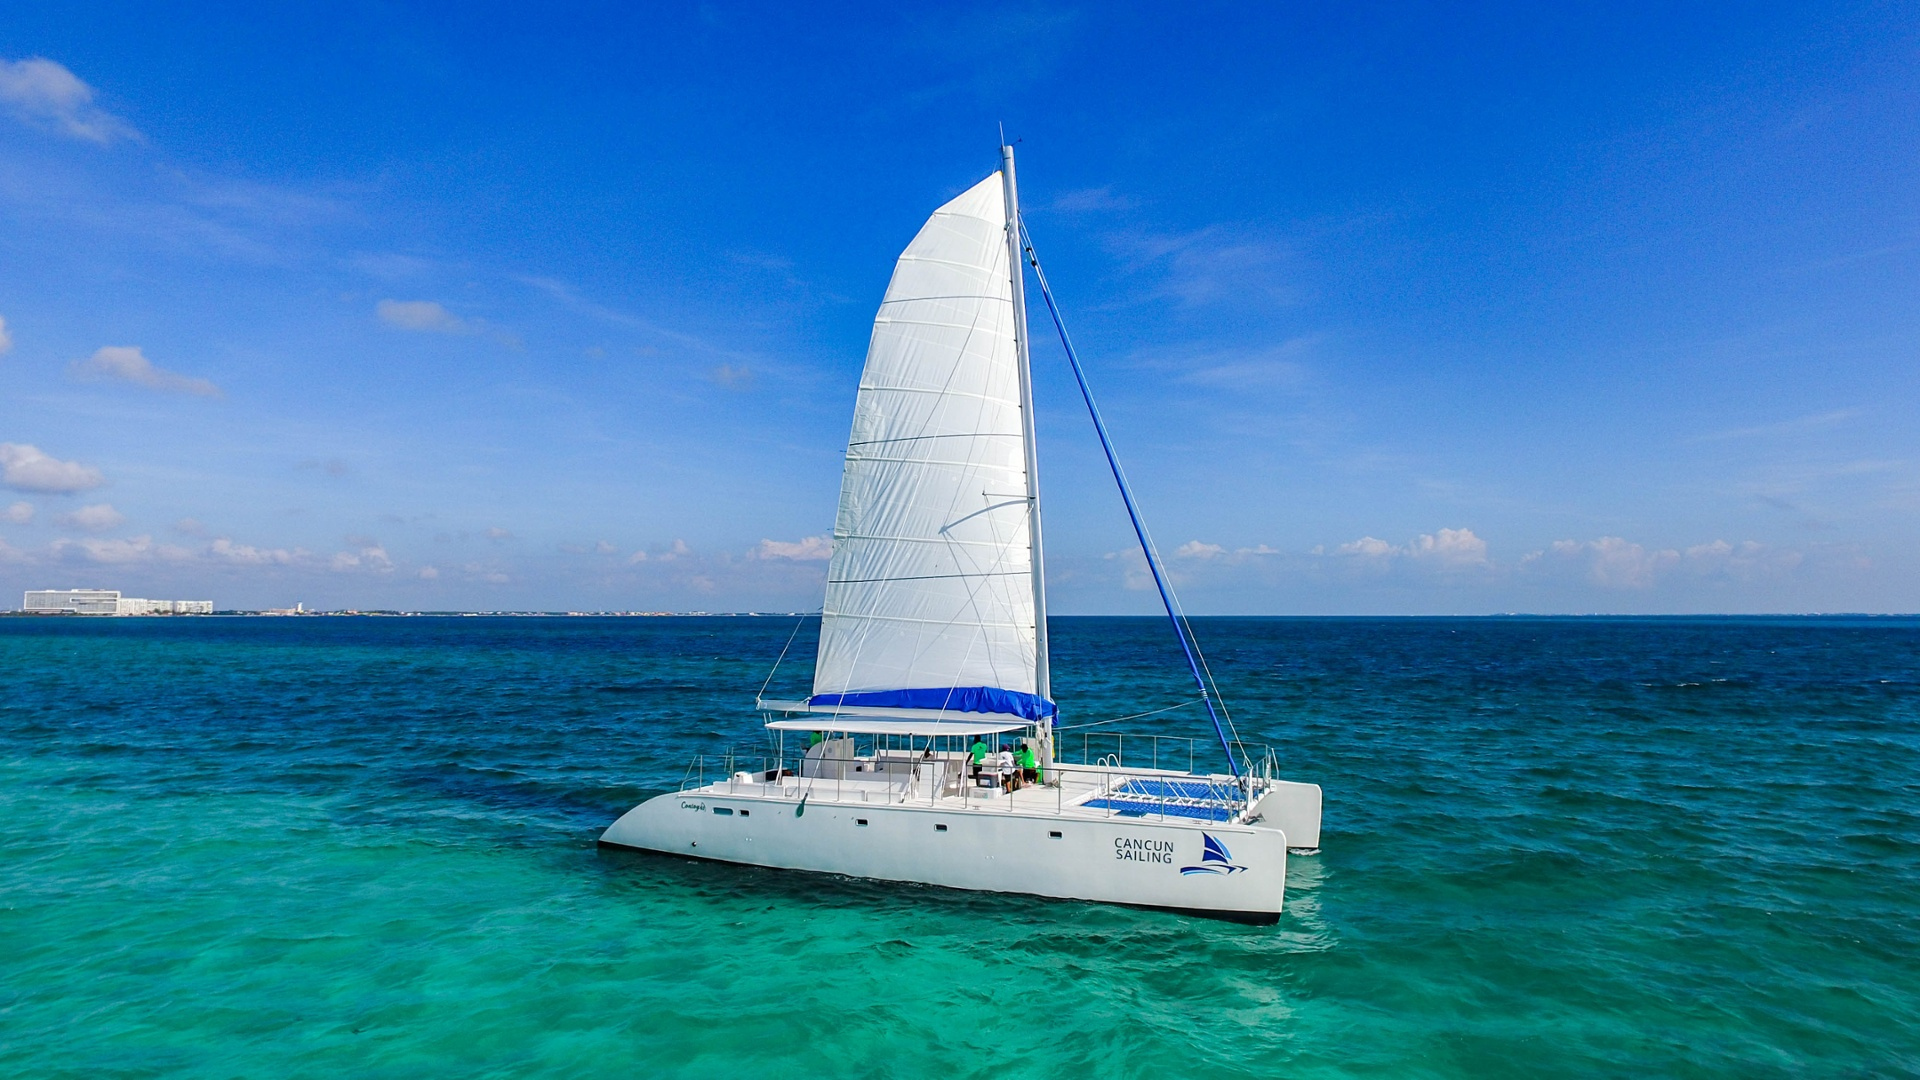 LowRes - Maines - Isla Mujeres Catamaran Tour - Cancun Sailing - 5